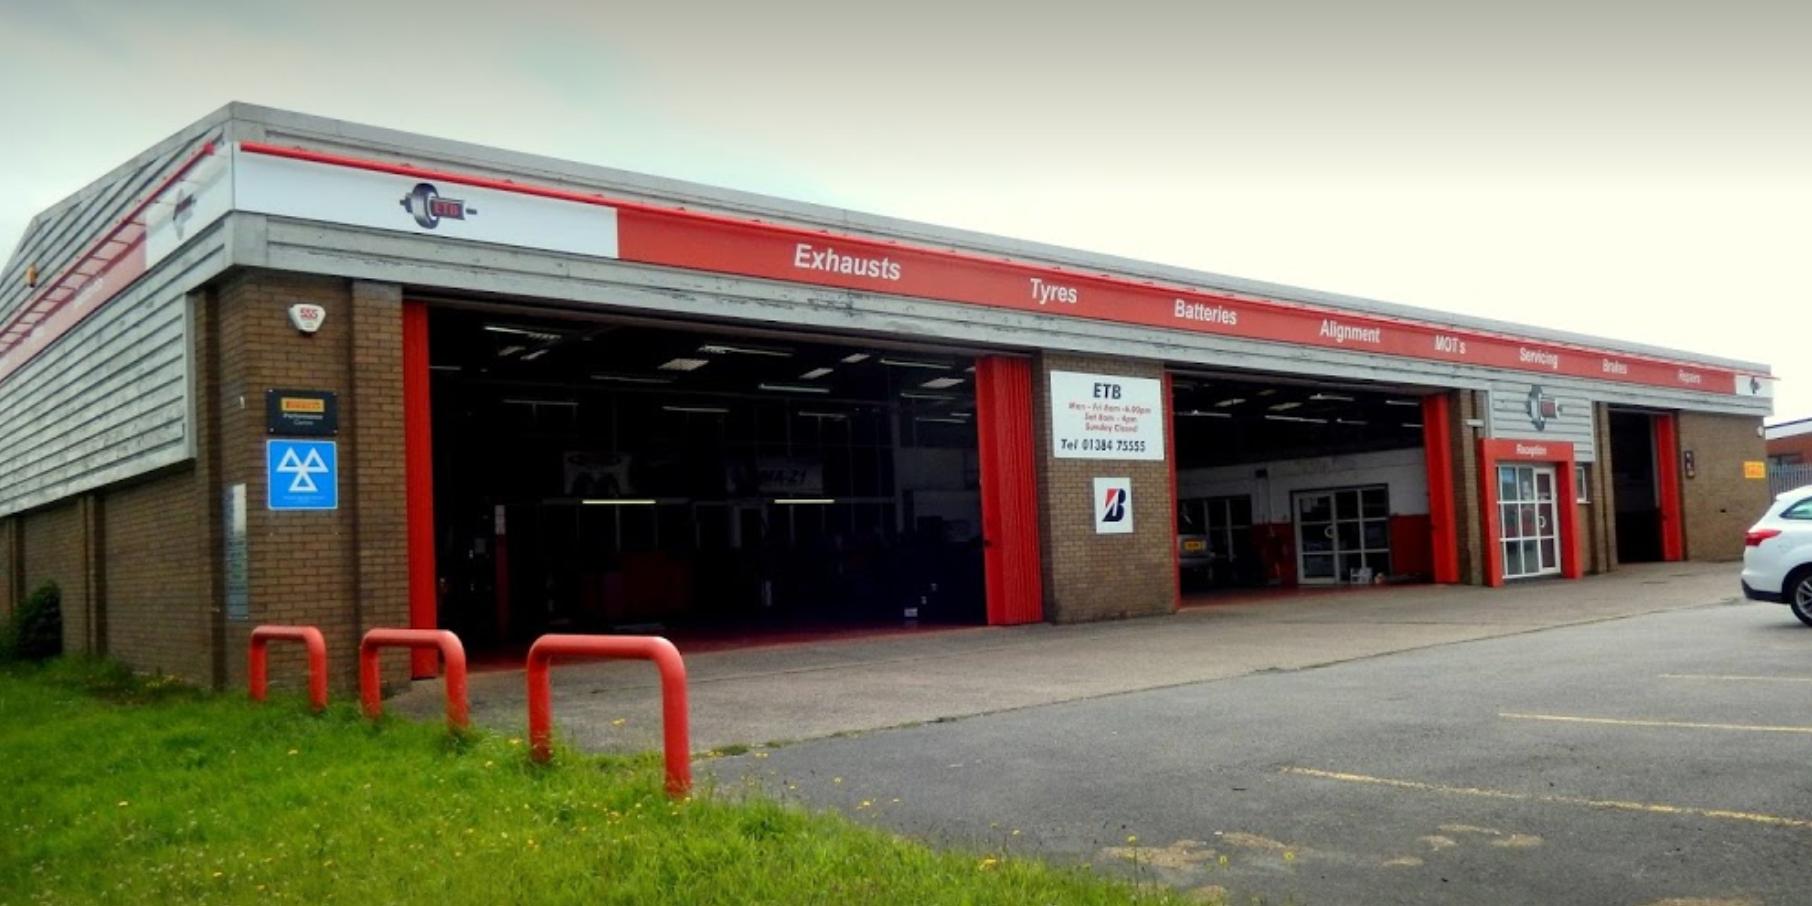 ETB - Exhaust Tyres & Batteries Merry Hill